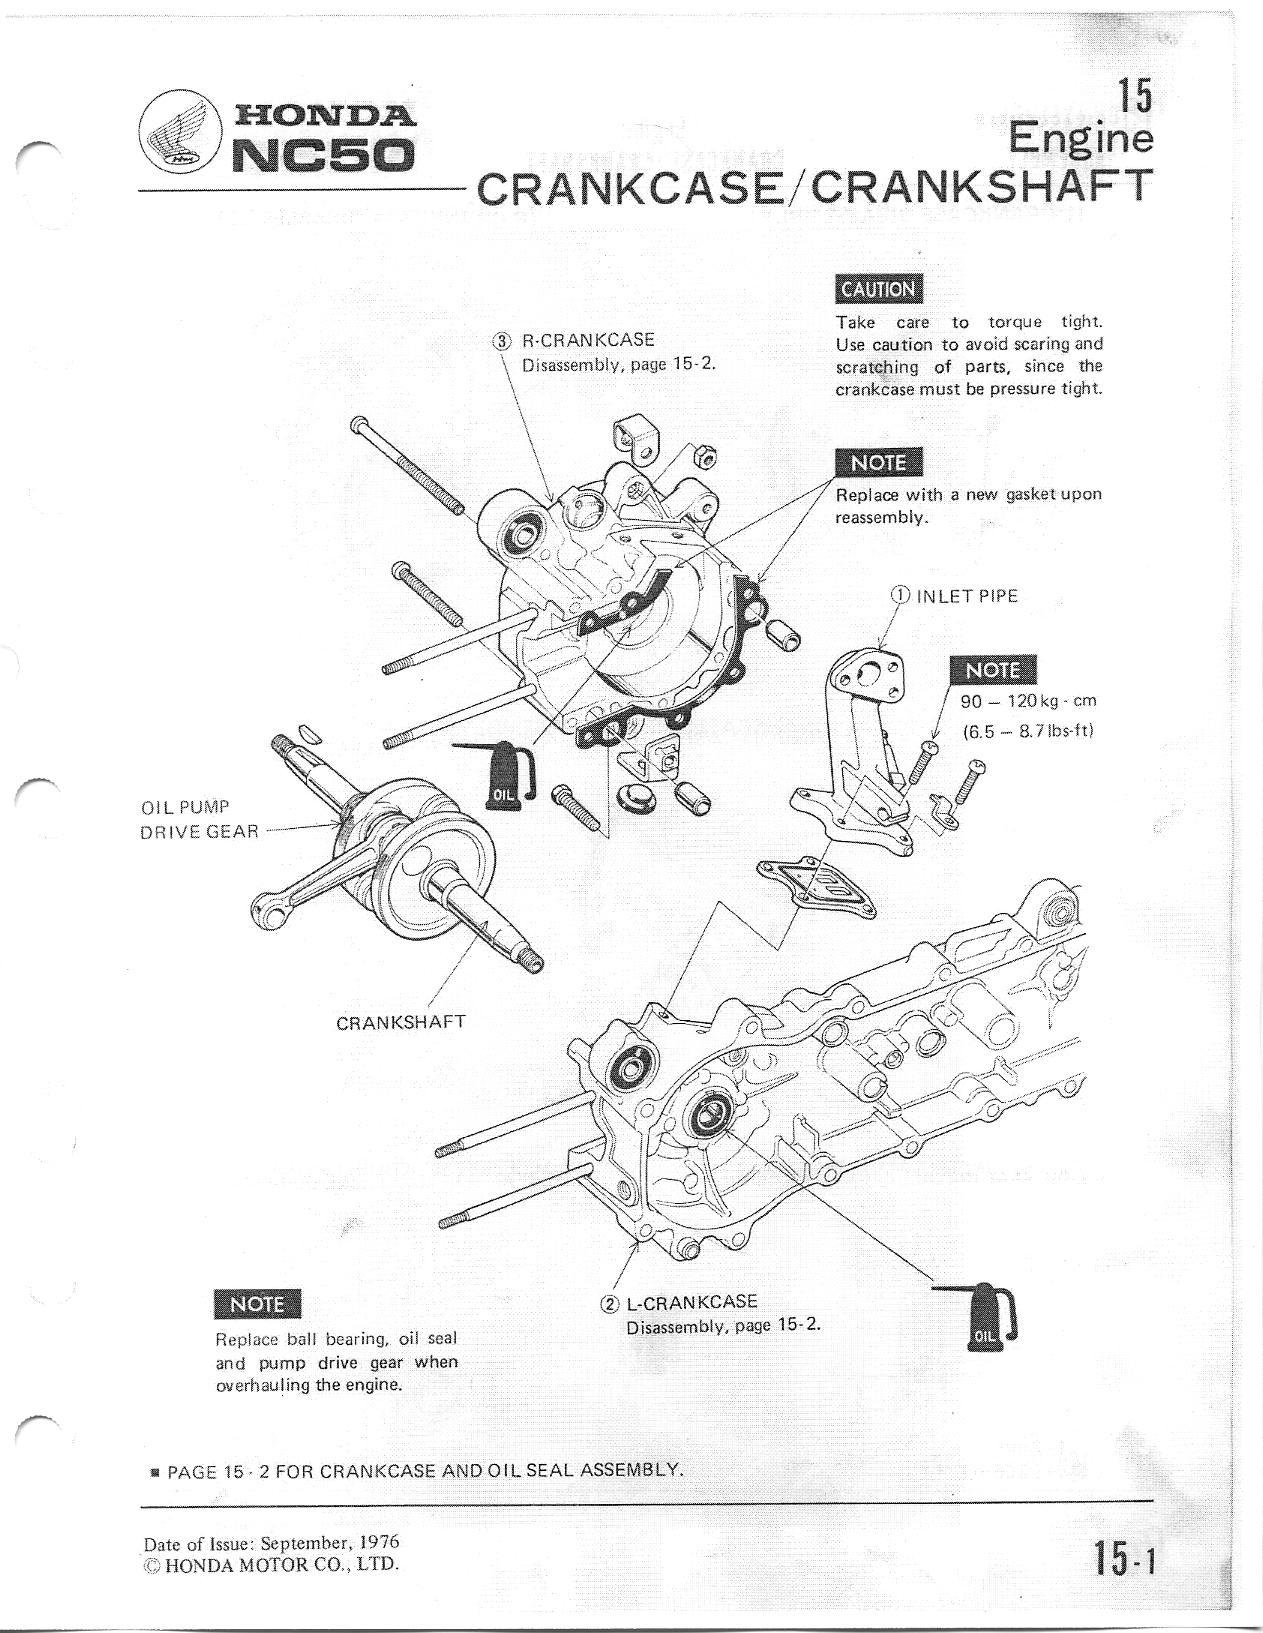 Honda Unicorn 150 Wiring Diagram